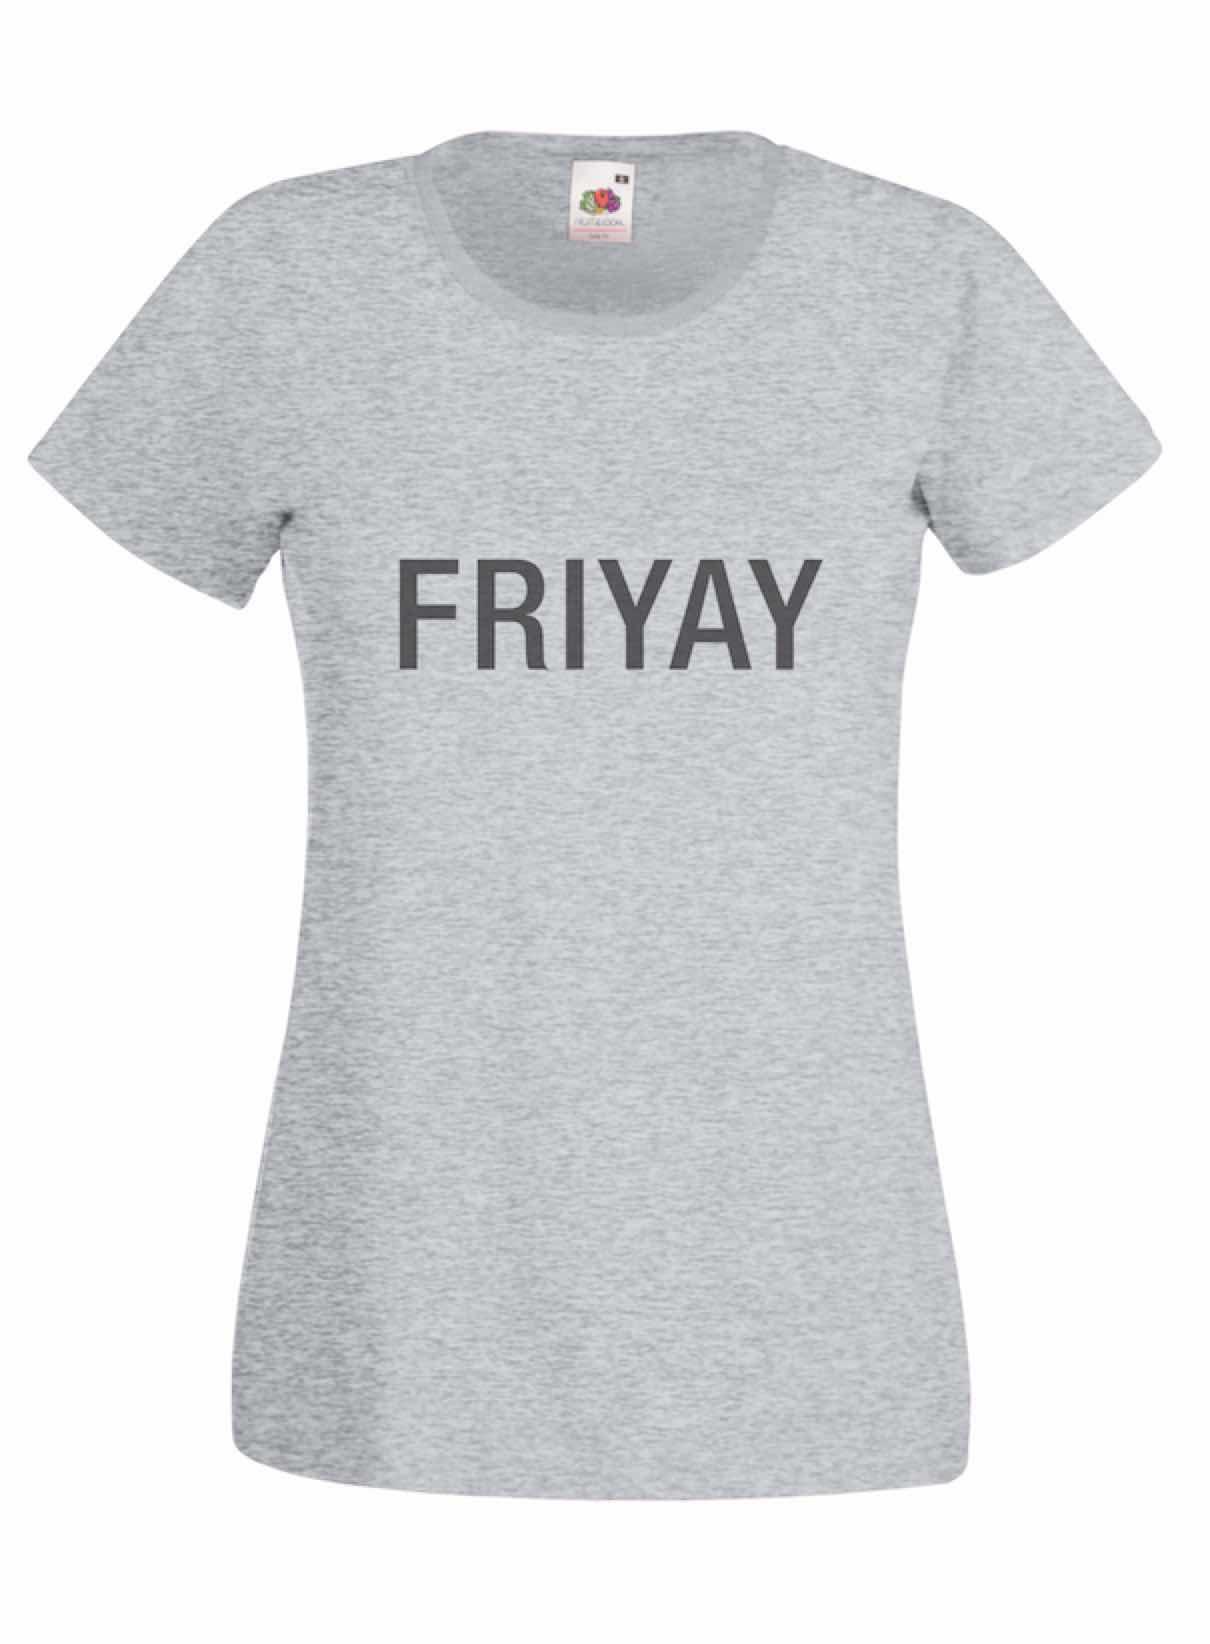 Friyay design for t-shirt, hoodie & sweatshirt